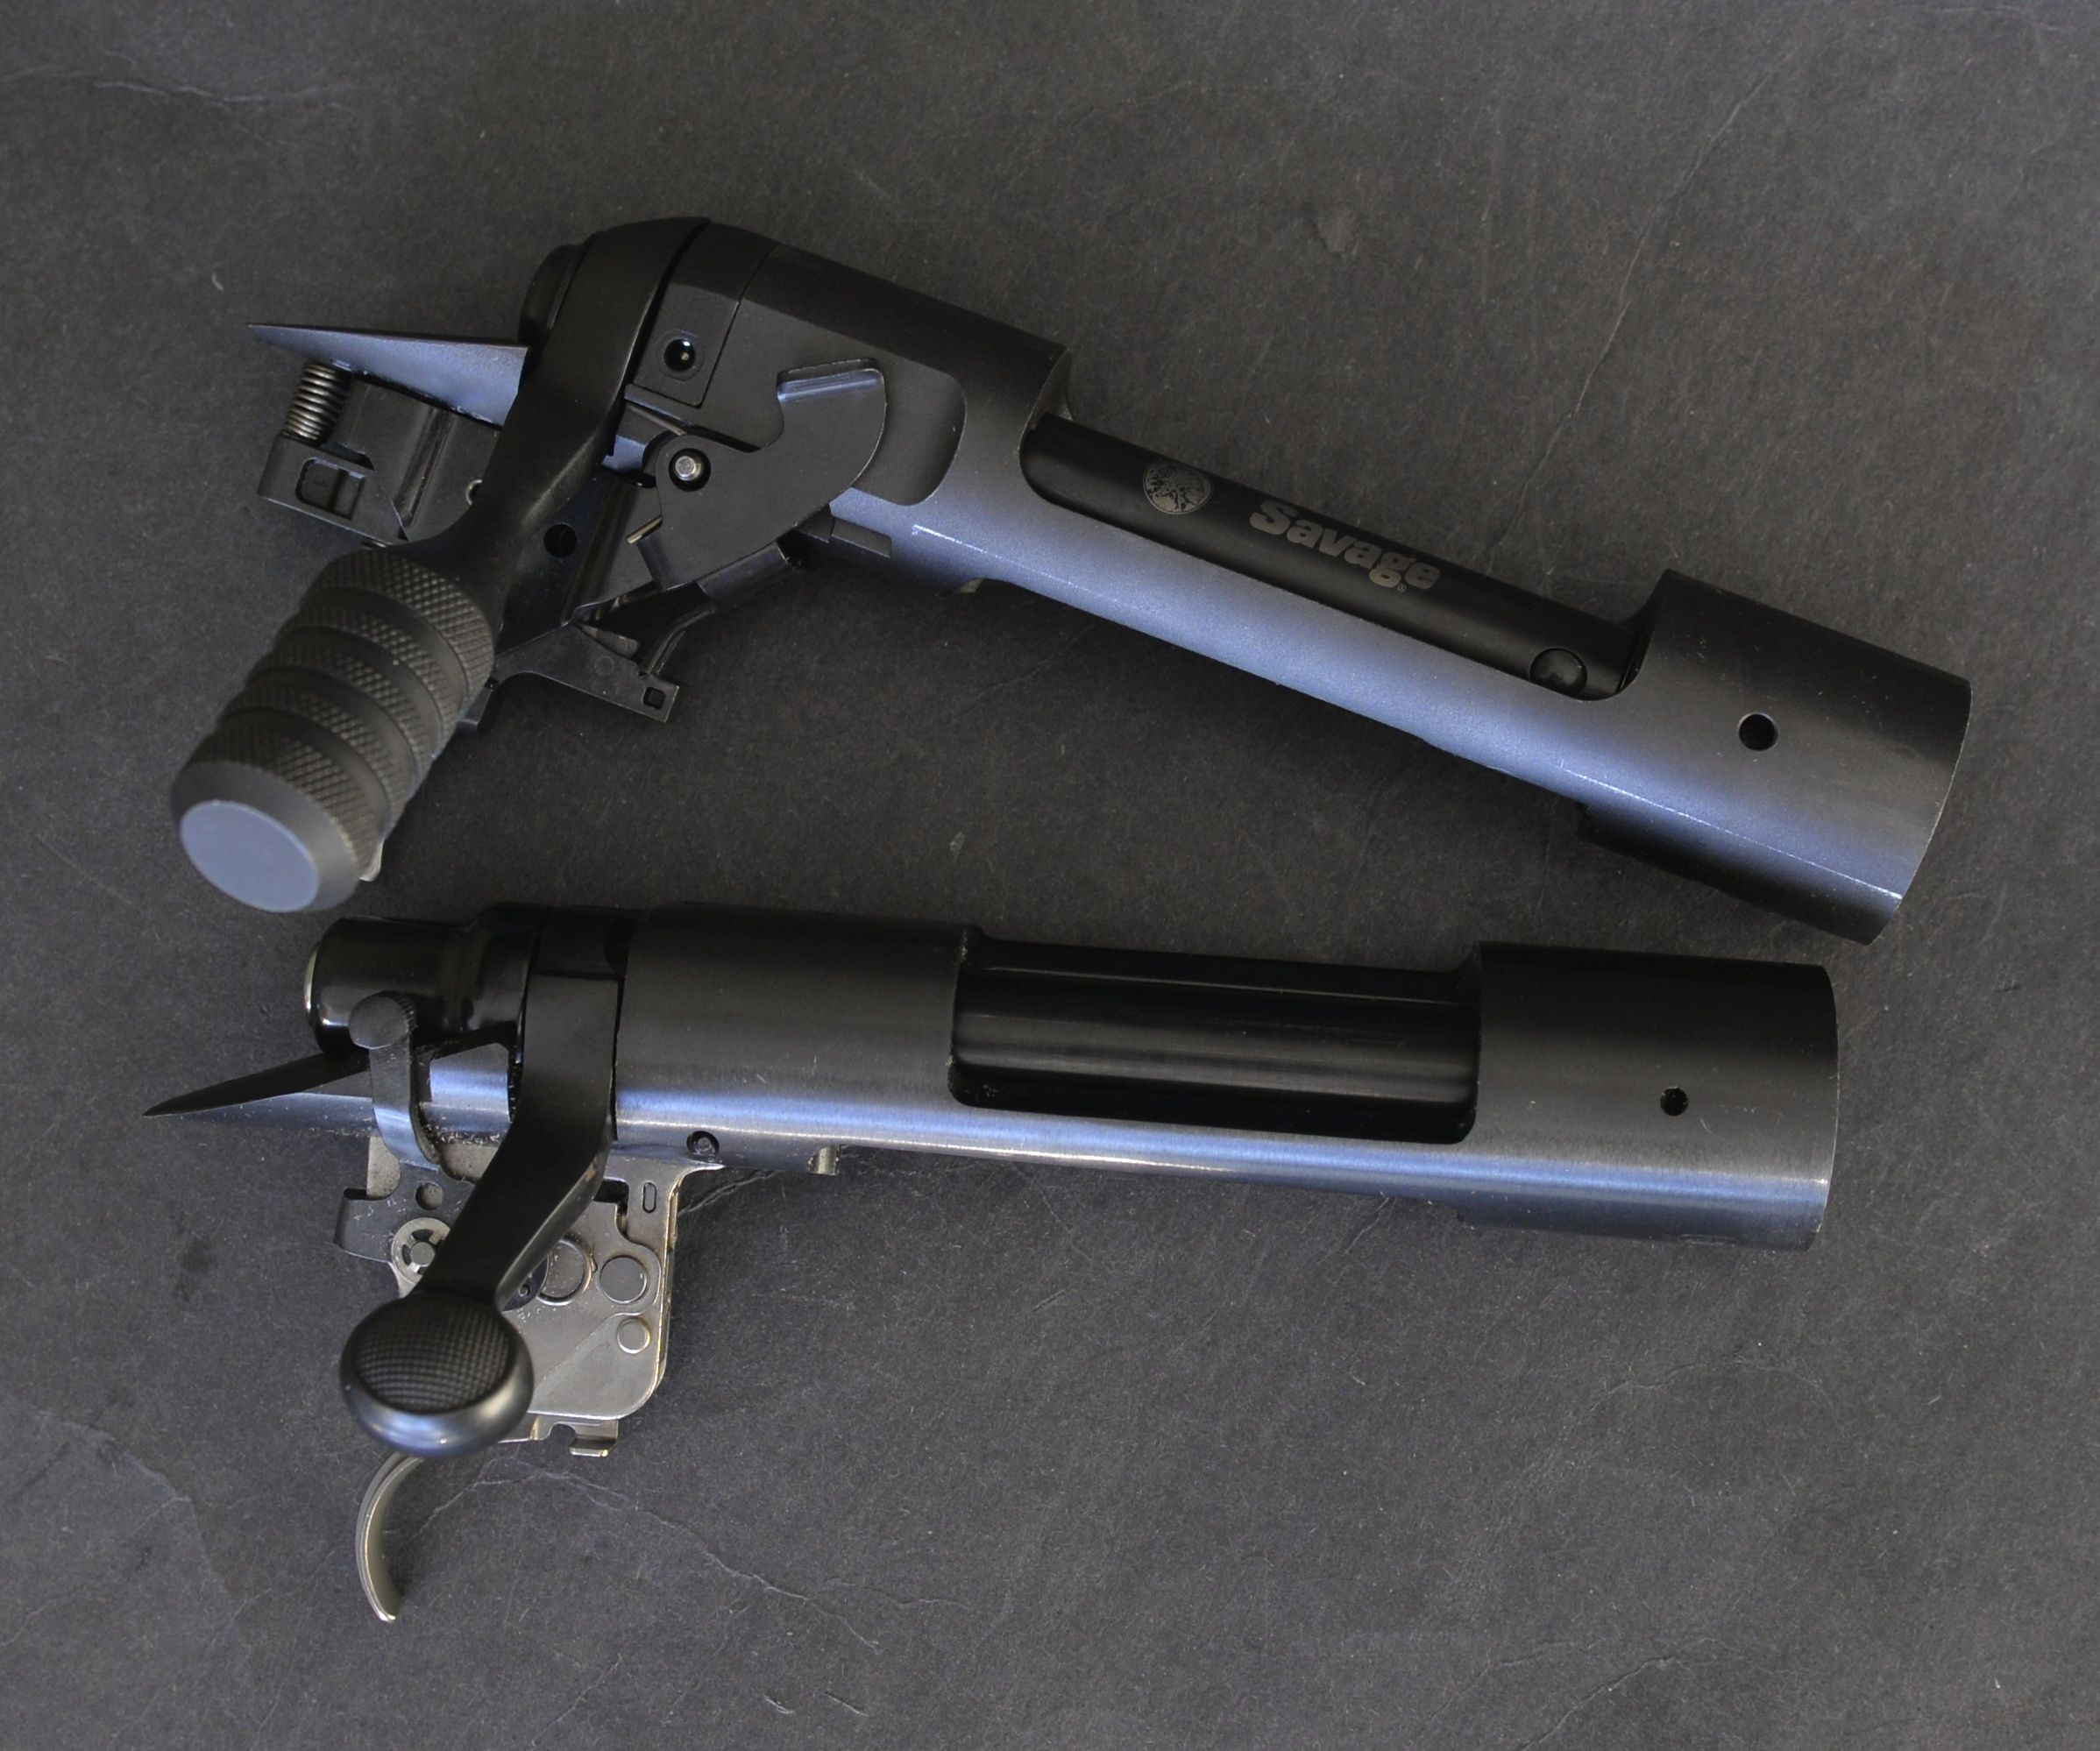 Remington 700 Versus Savage 10/110: Comparative Design